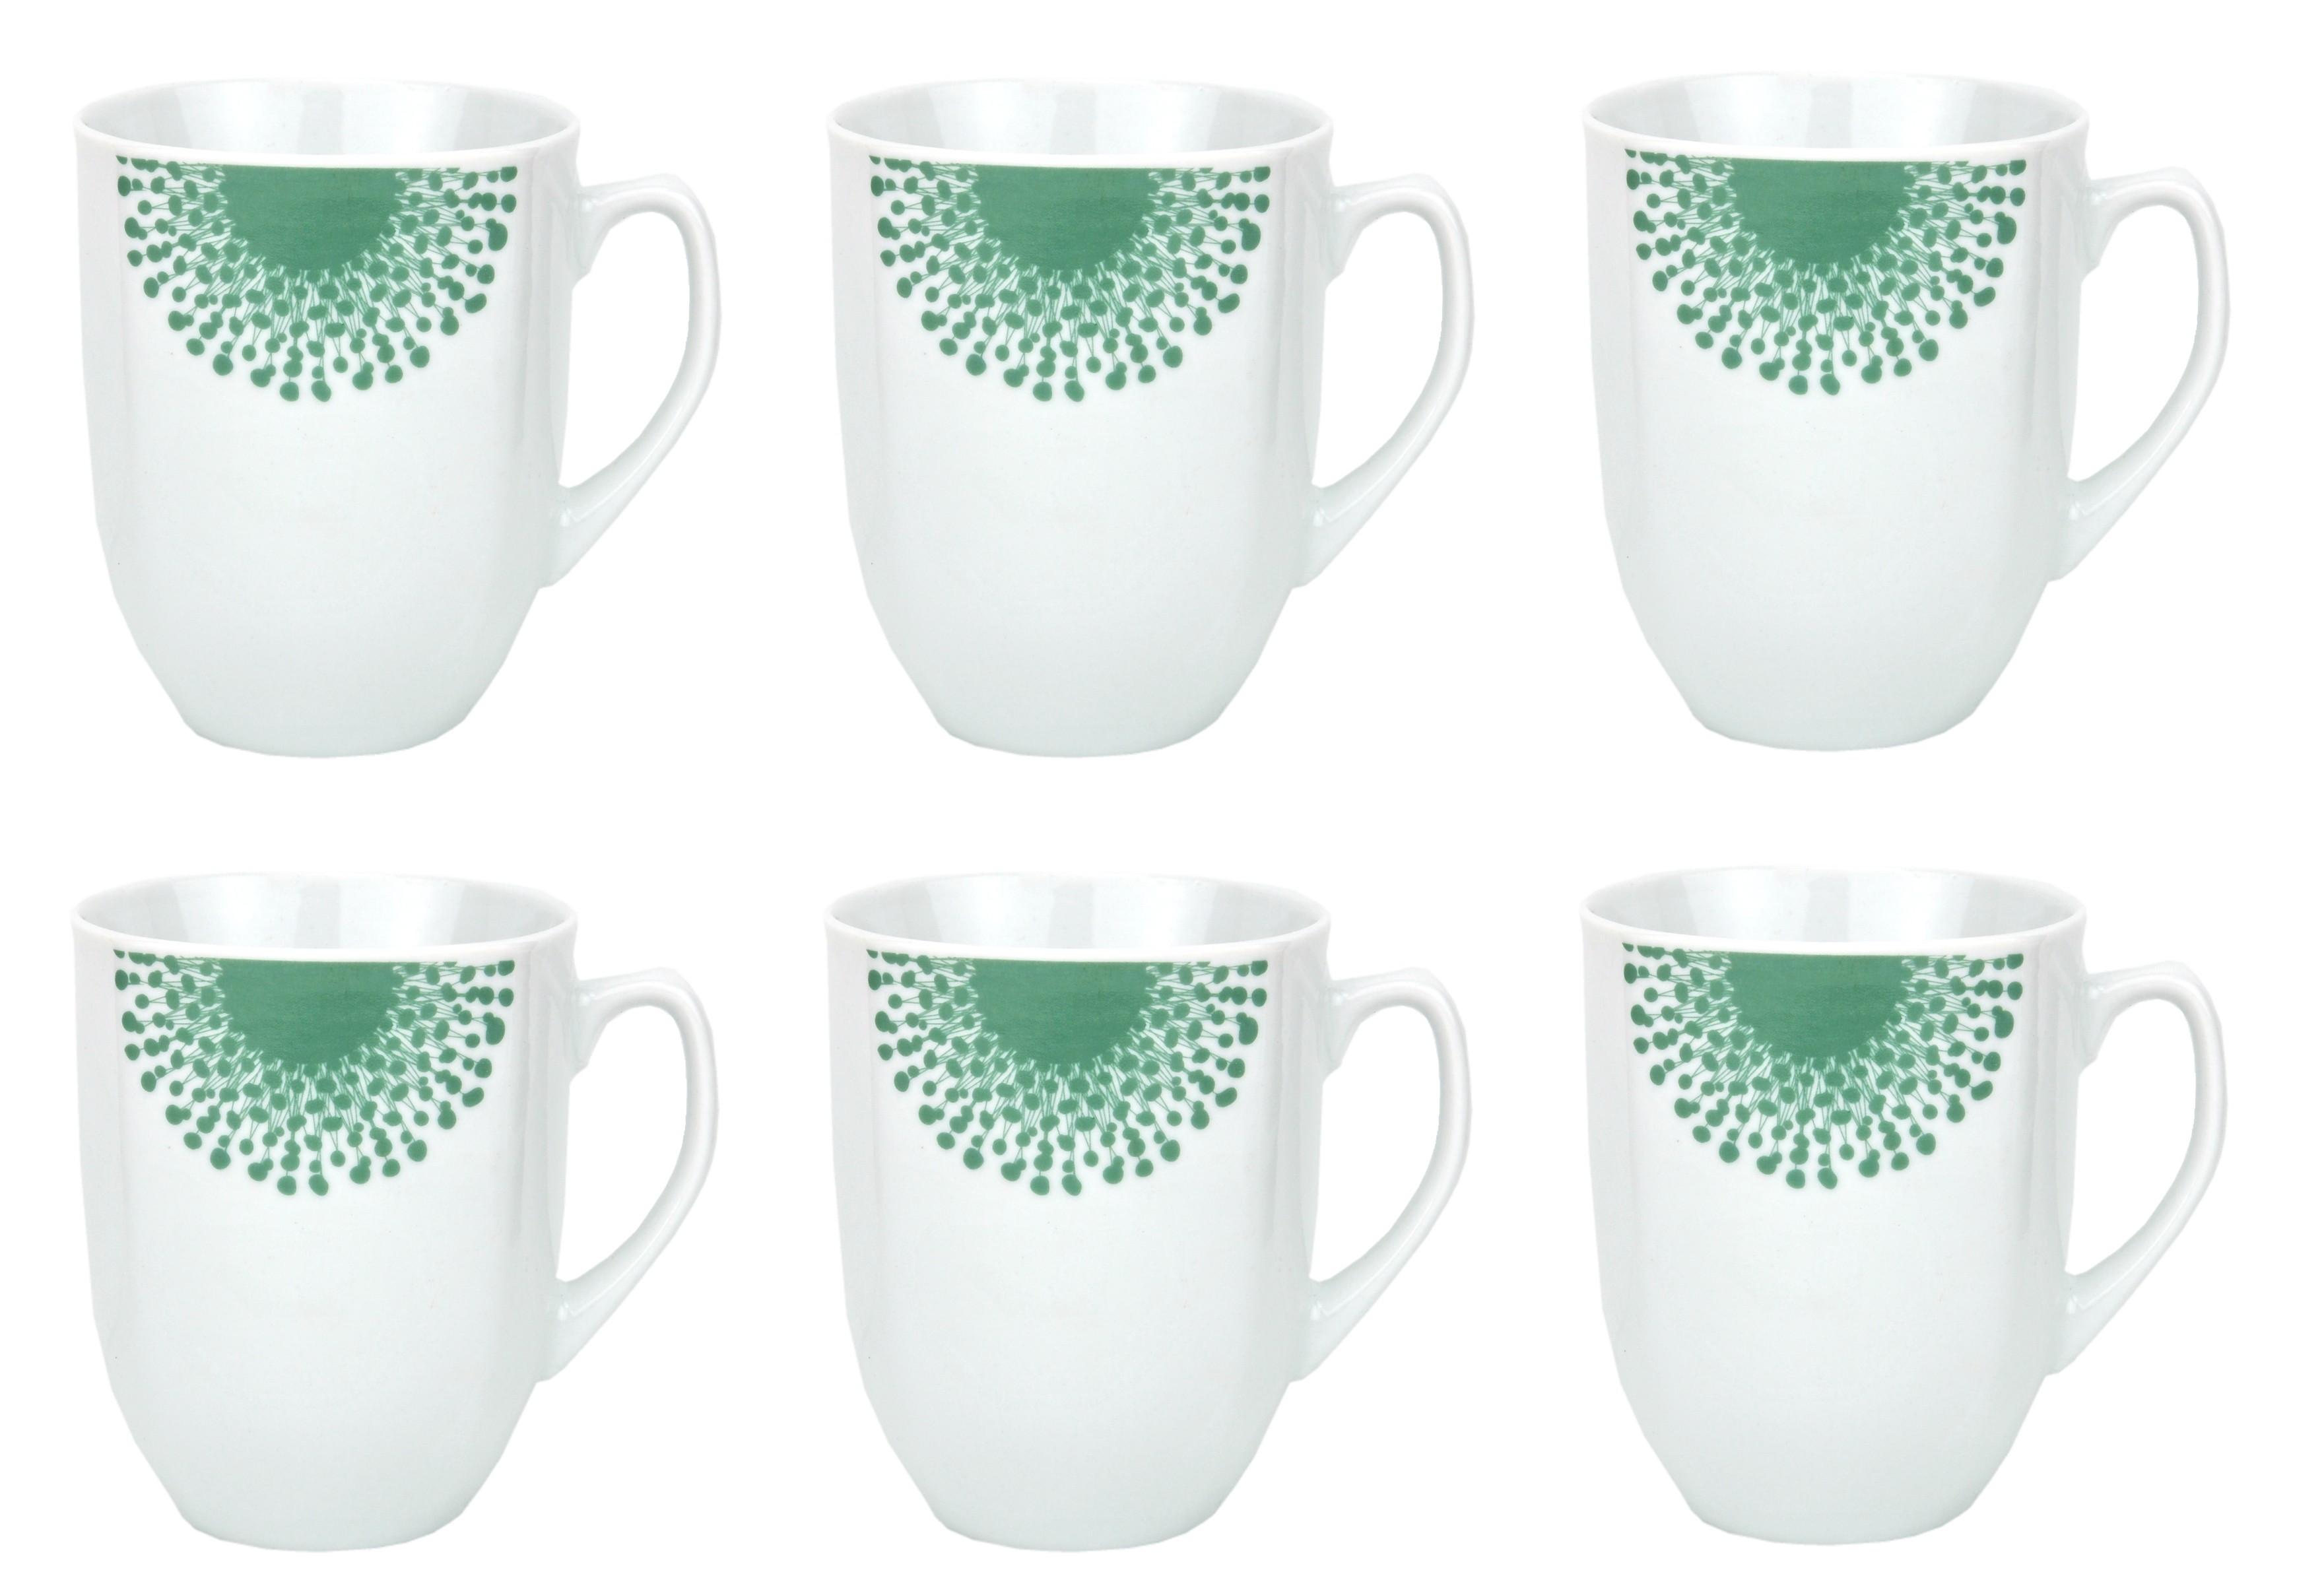 6er set kaffeebecher modena pusteblume 33cl porzellan tassen und becher. Black Bedroom Furniture Sets. Home Design Ideas